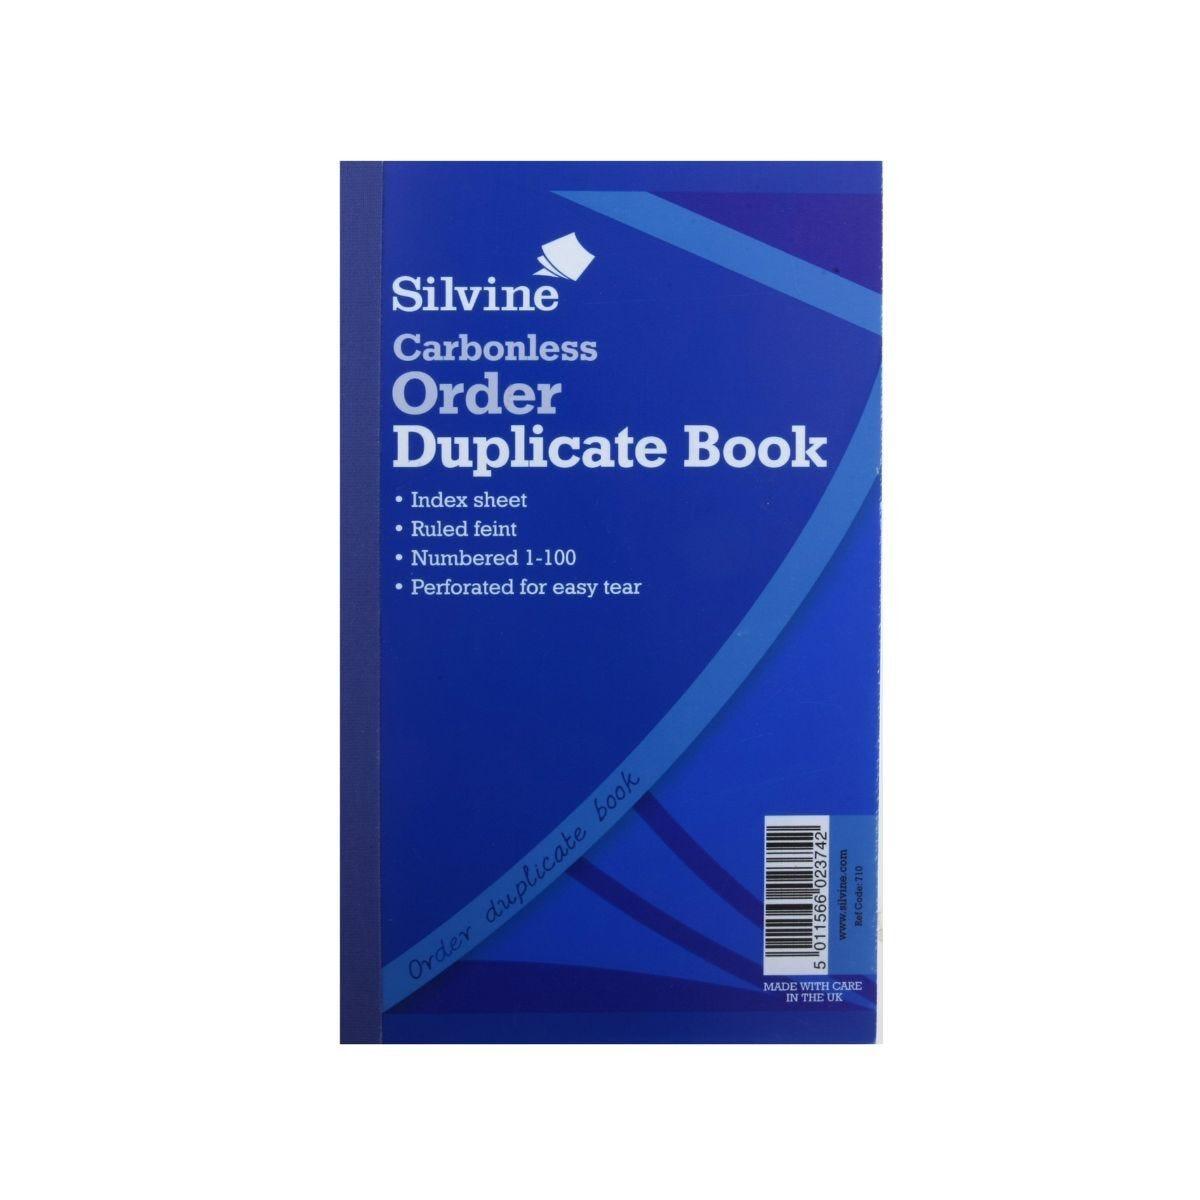 Silvine Duplicate Order Book Carbonless Carbonless Numbered 1-100 100 Sheets